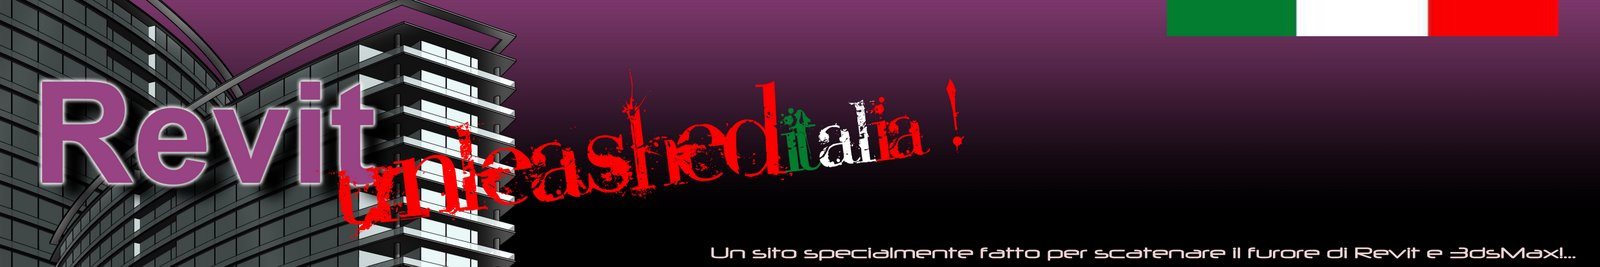 Revit Unleashed Italia !